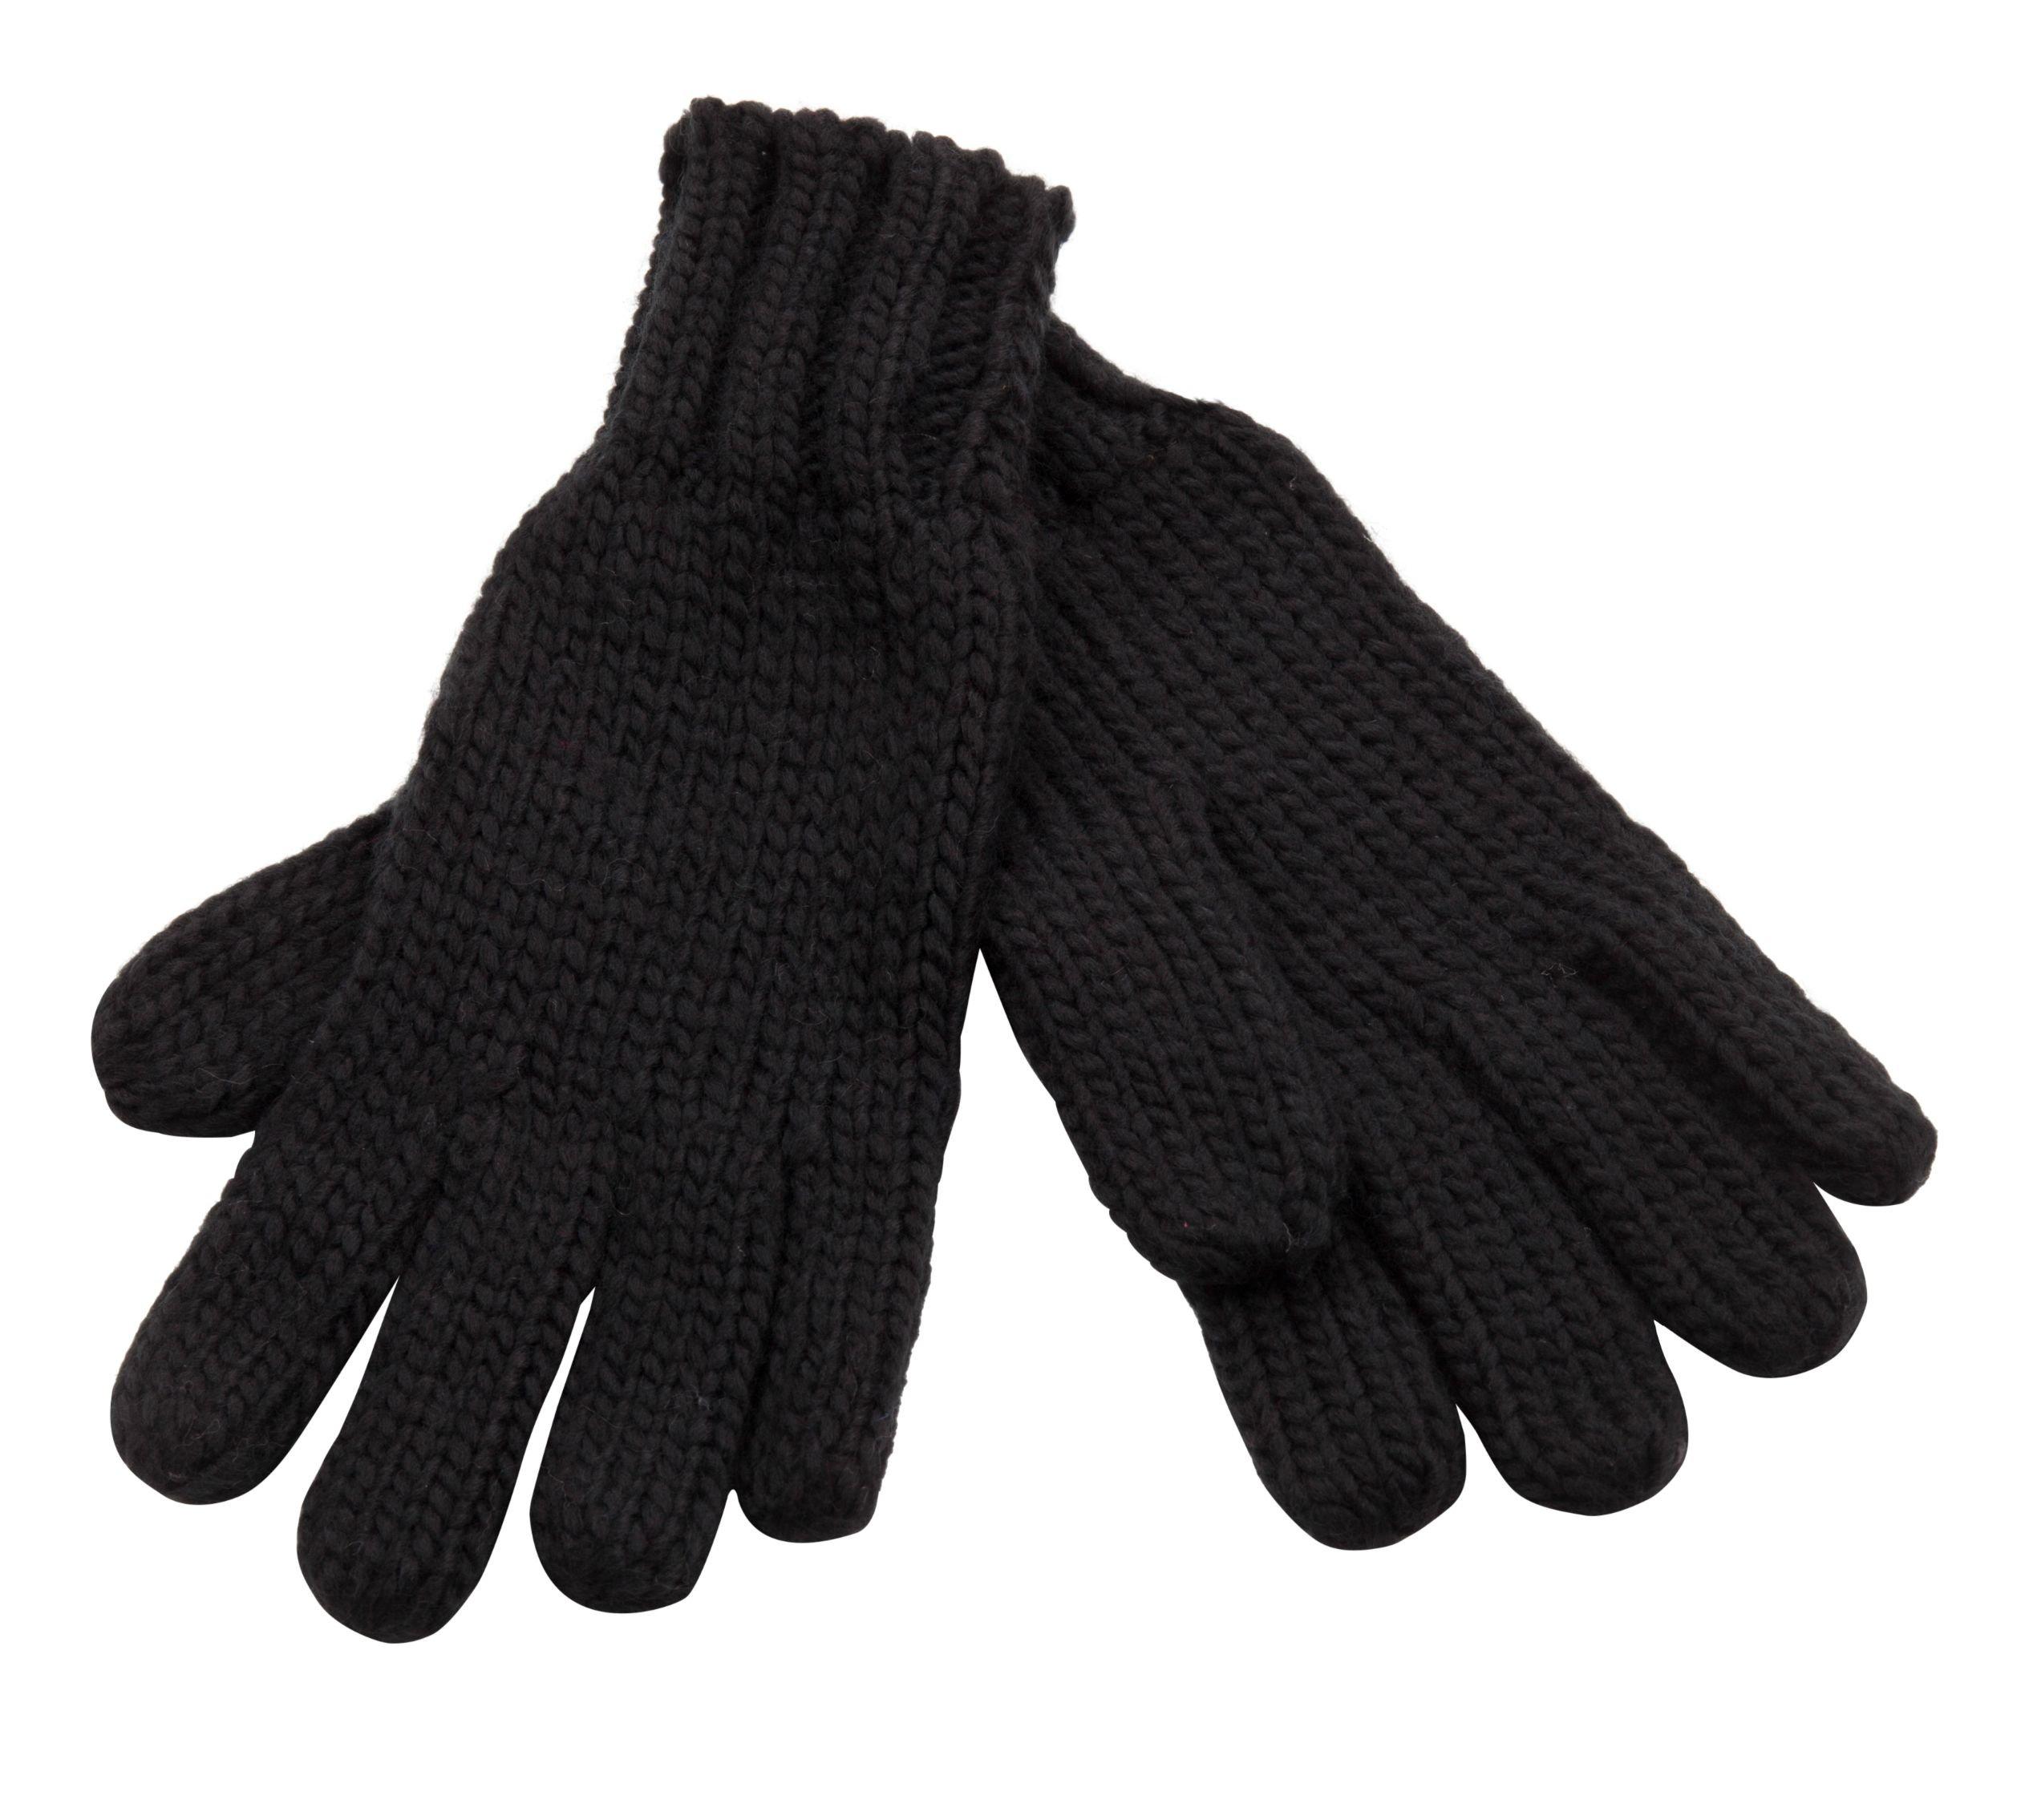 Isaac Mizrahi Women's Knit Glove with Rib Trim, (BLACK)